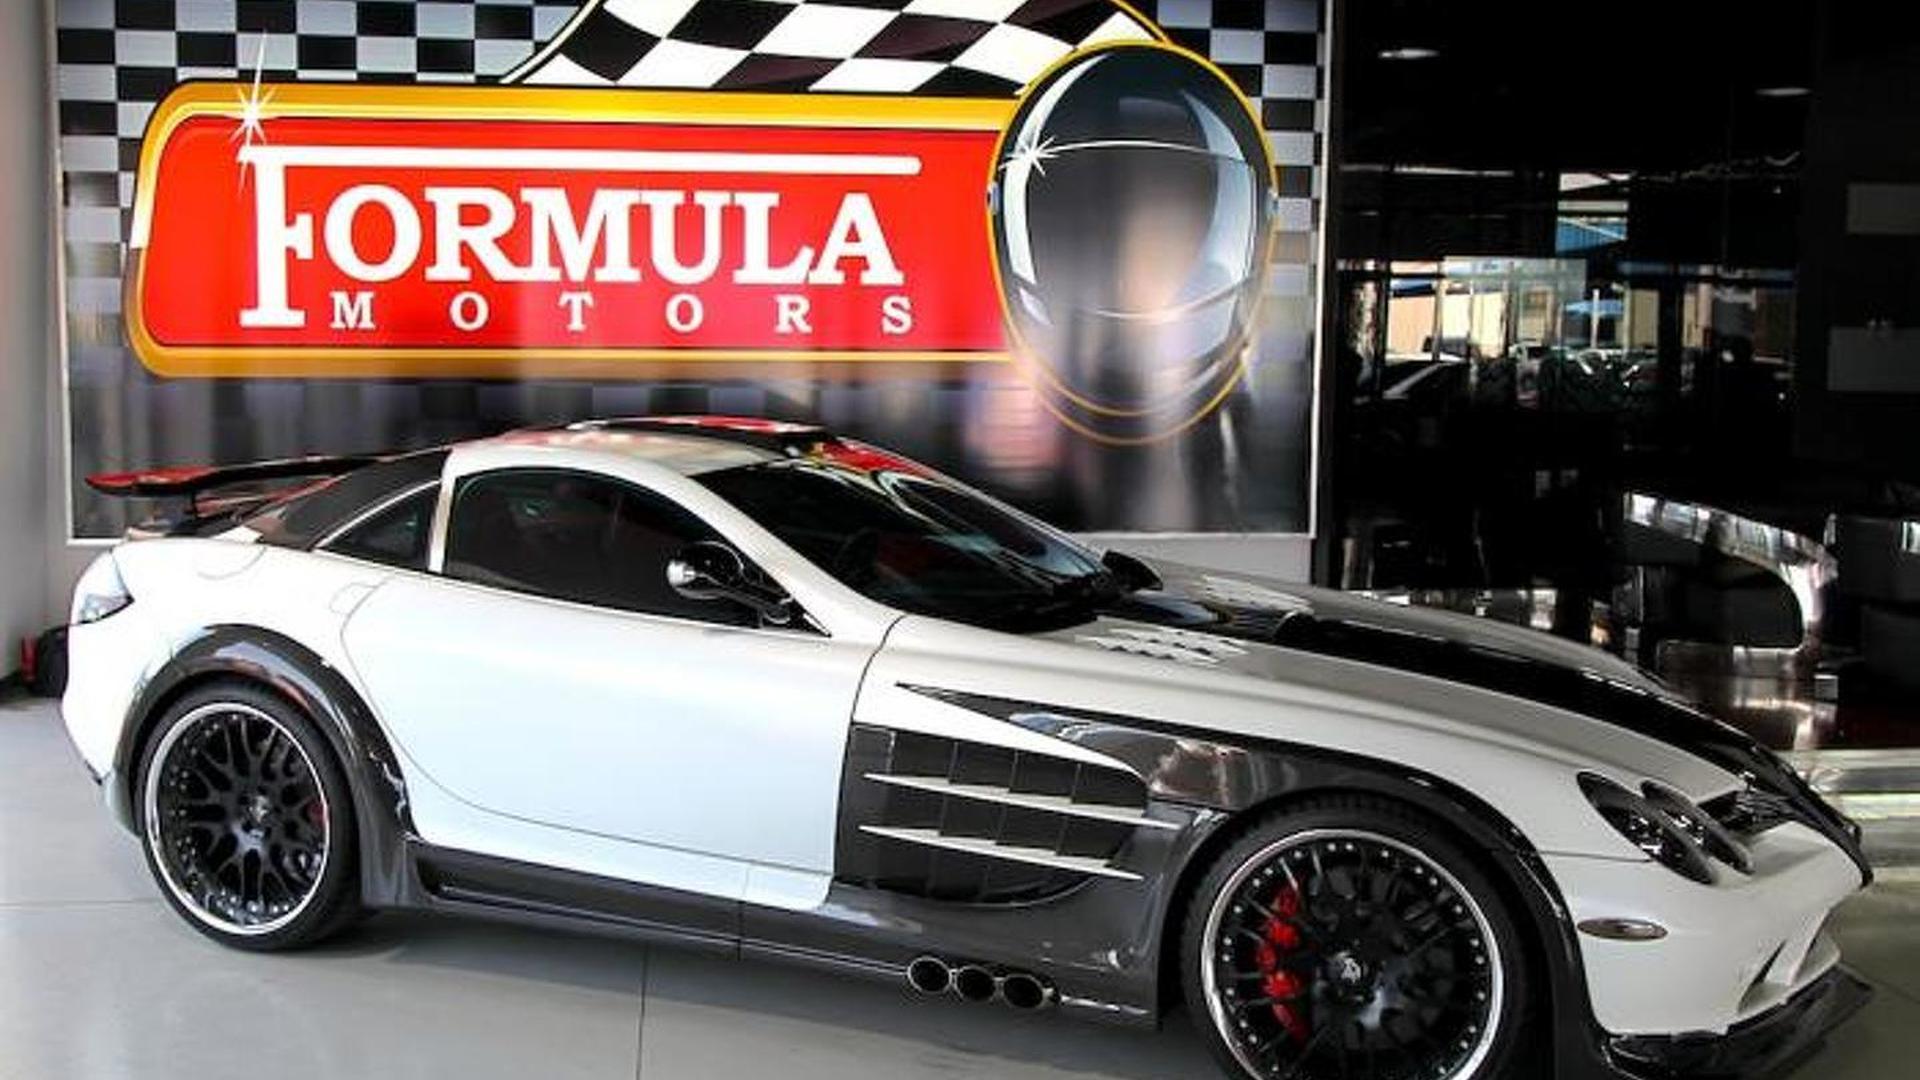 Flashy-looking Mercedes-Benz SLR Volcano by Hamann on sale in Dubai